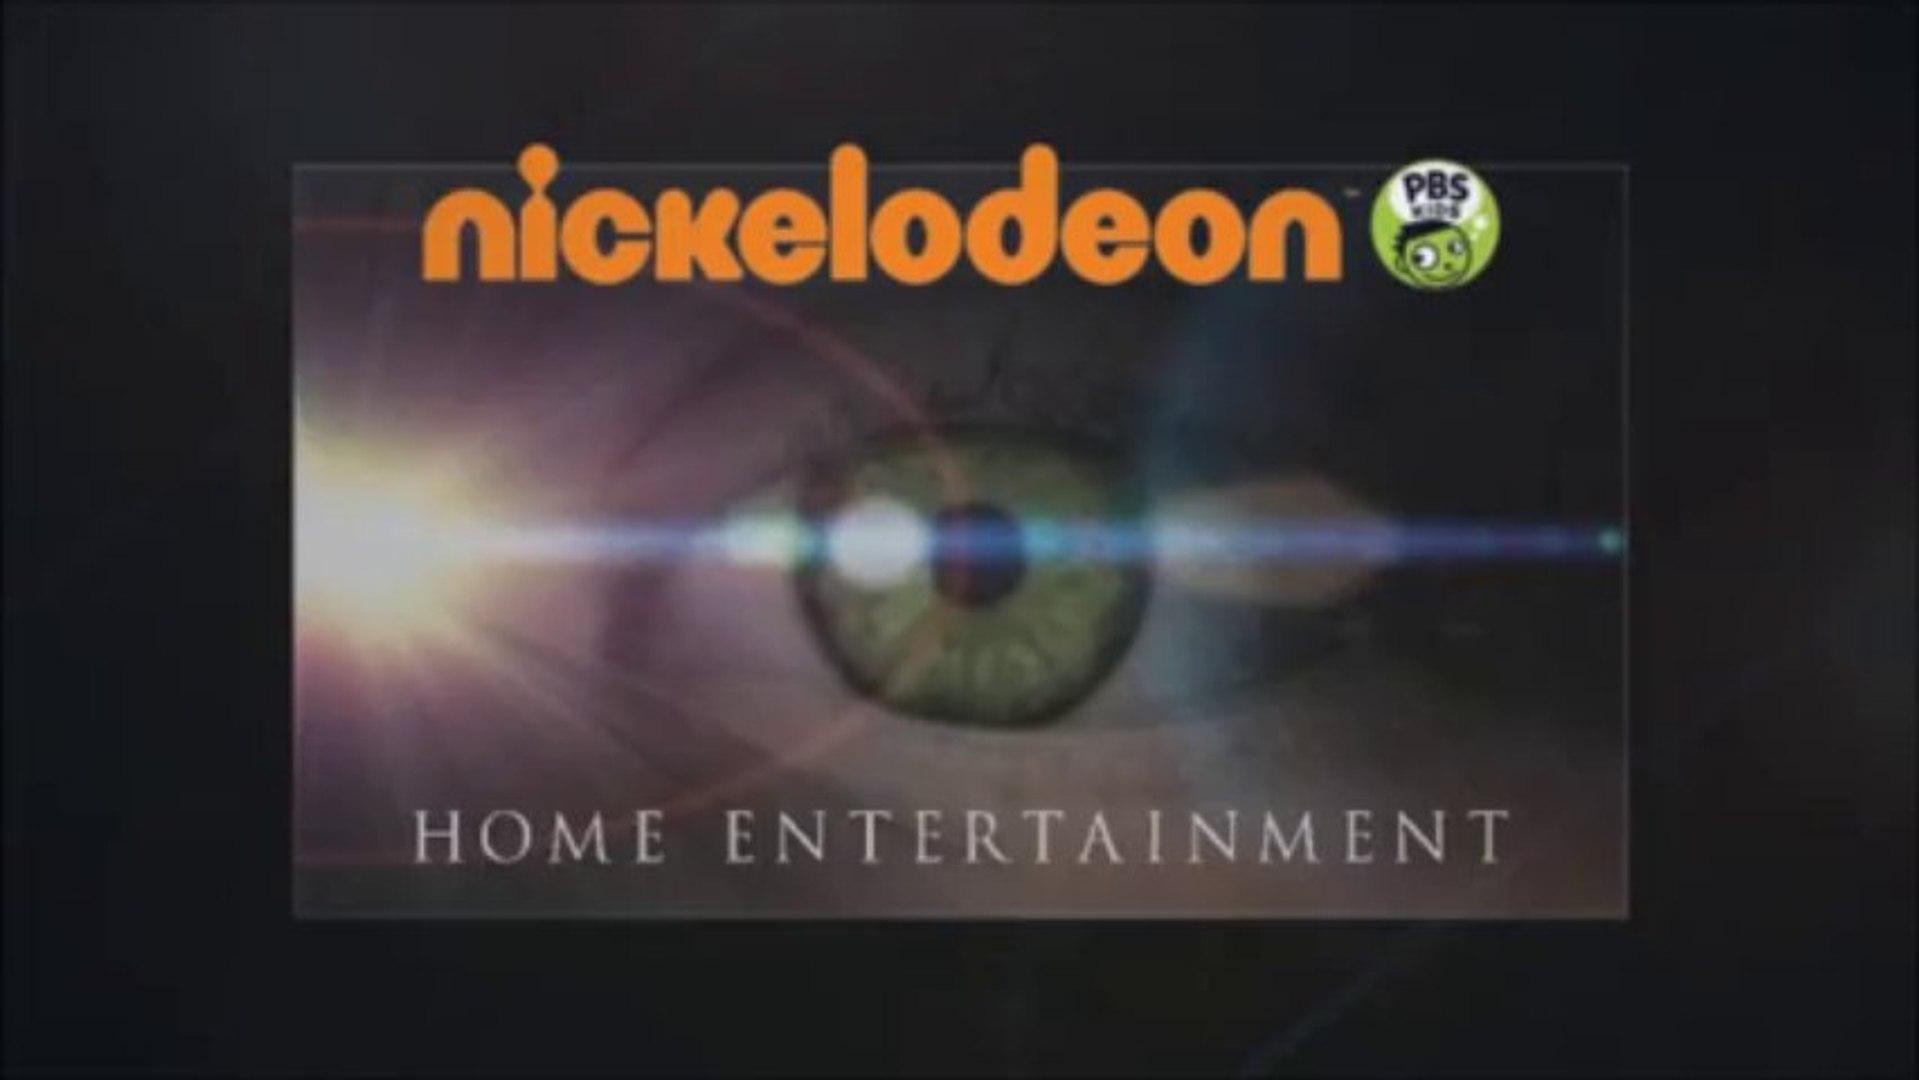 Nickelodeon/PBS Kids Home Entertainment logo (February 2013)